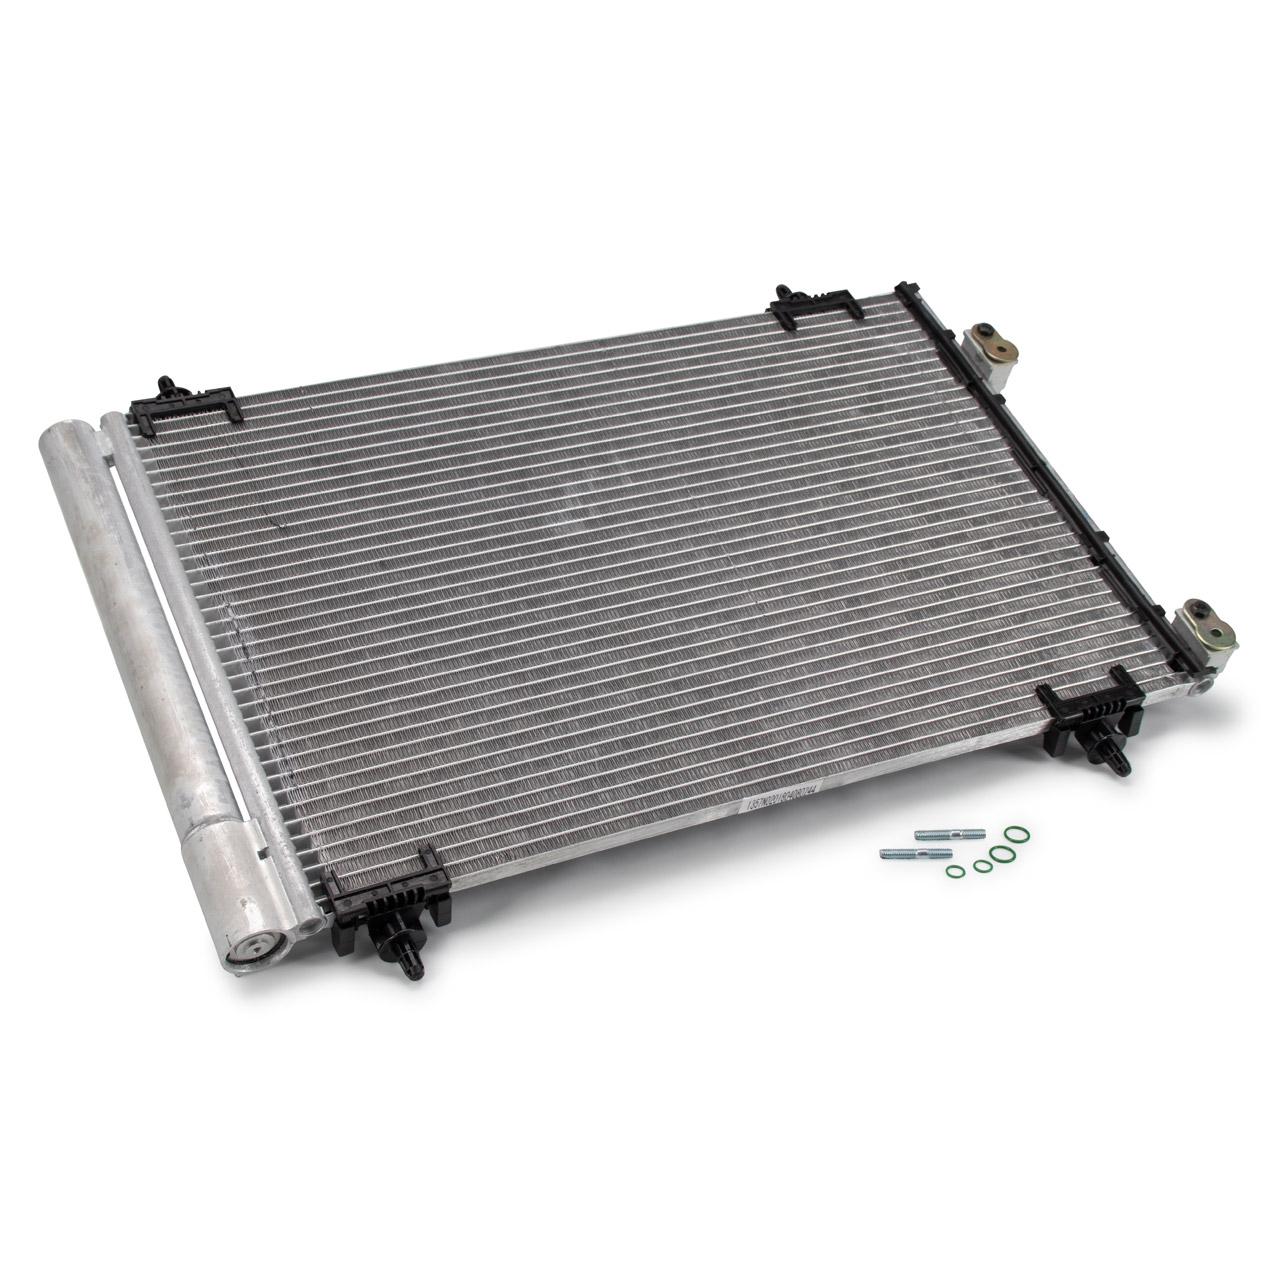 NRF 35610 Kondensator Klima EASY FIT PEUGEOT 307 308 1 RCZ 3008 CITROEN C4 1 2 Berlingo B9